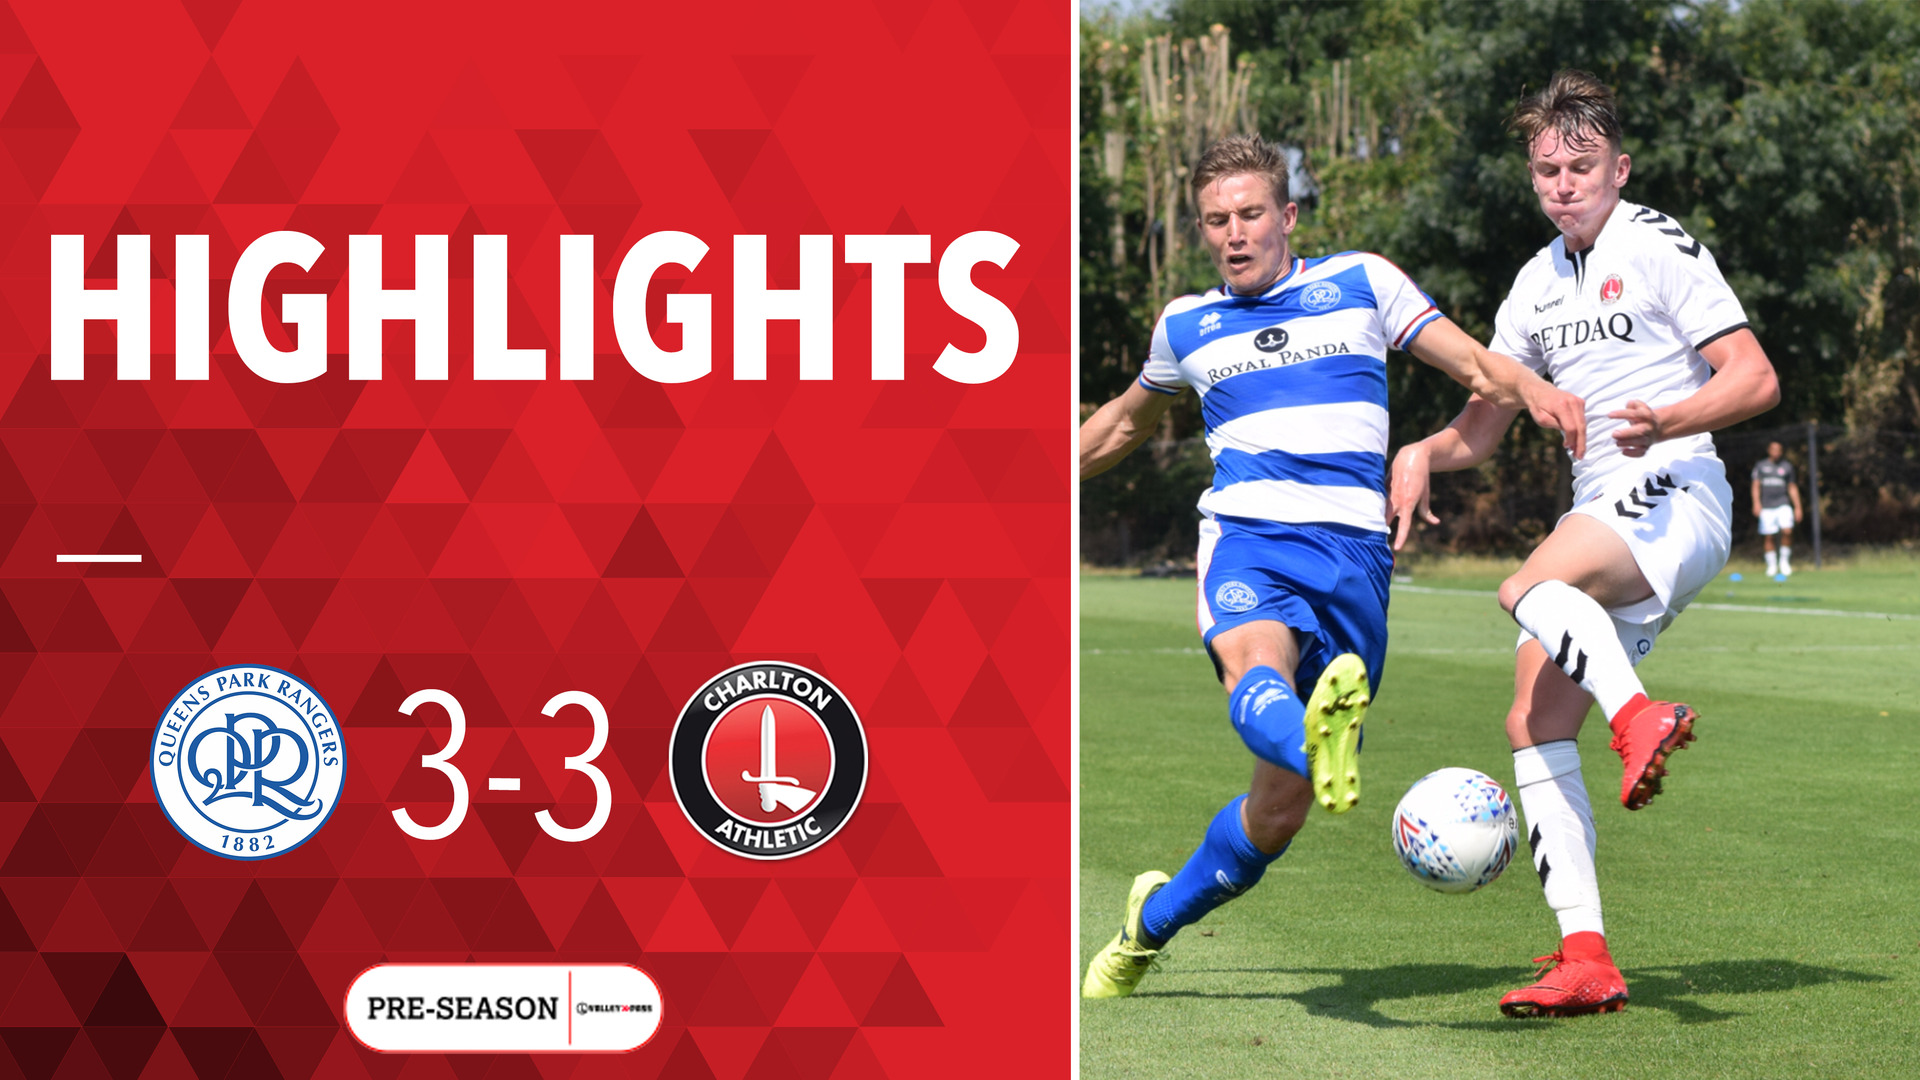 HIGHLIGHTS | QPR 3 Charlton 3 (Pre-season July 2018)